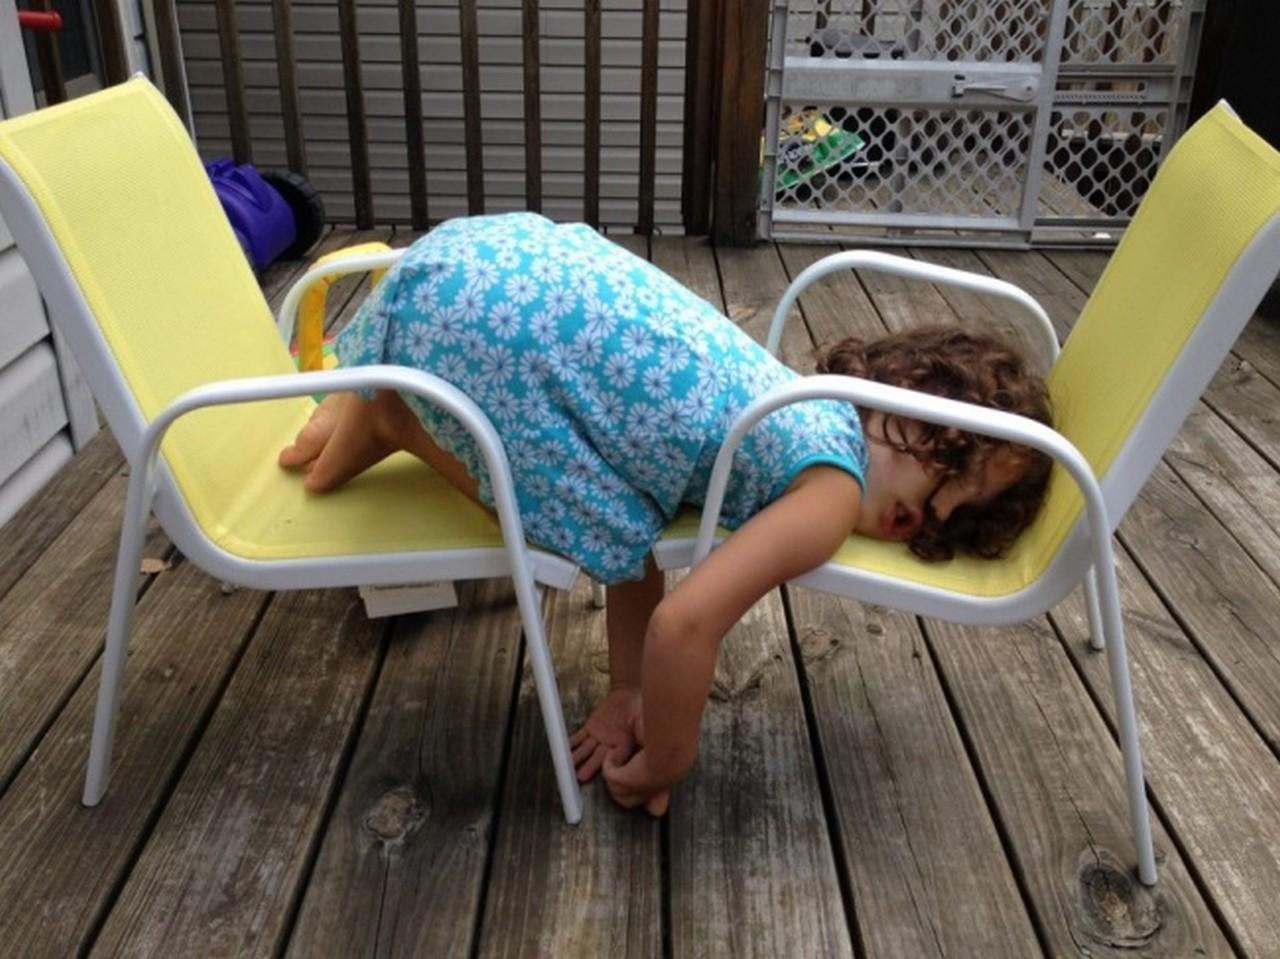 11 - Awkward Sleeping Moments, Part Deux